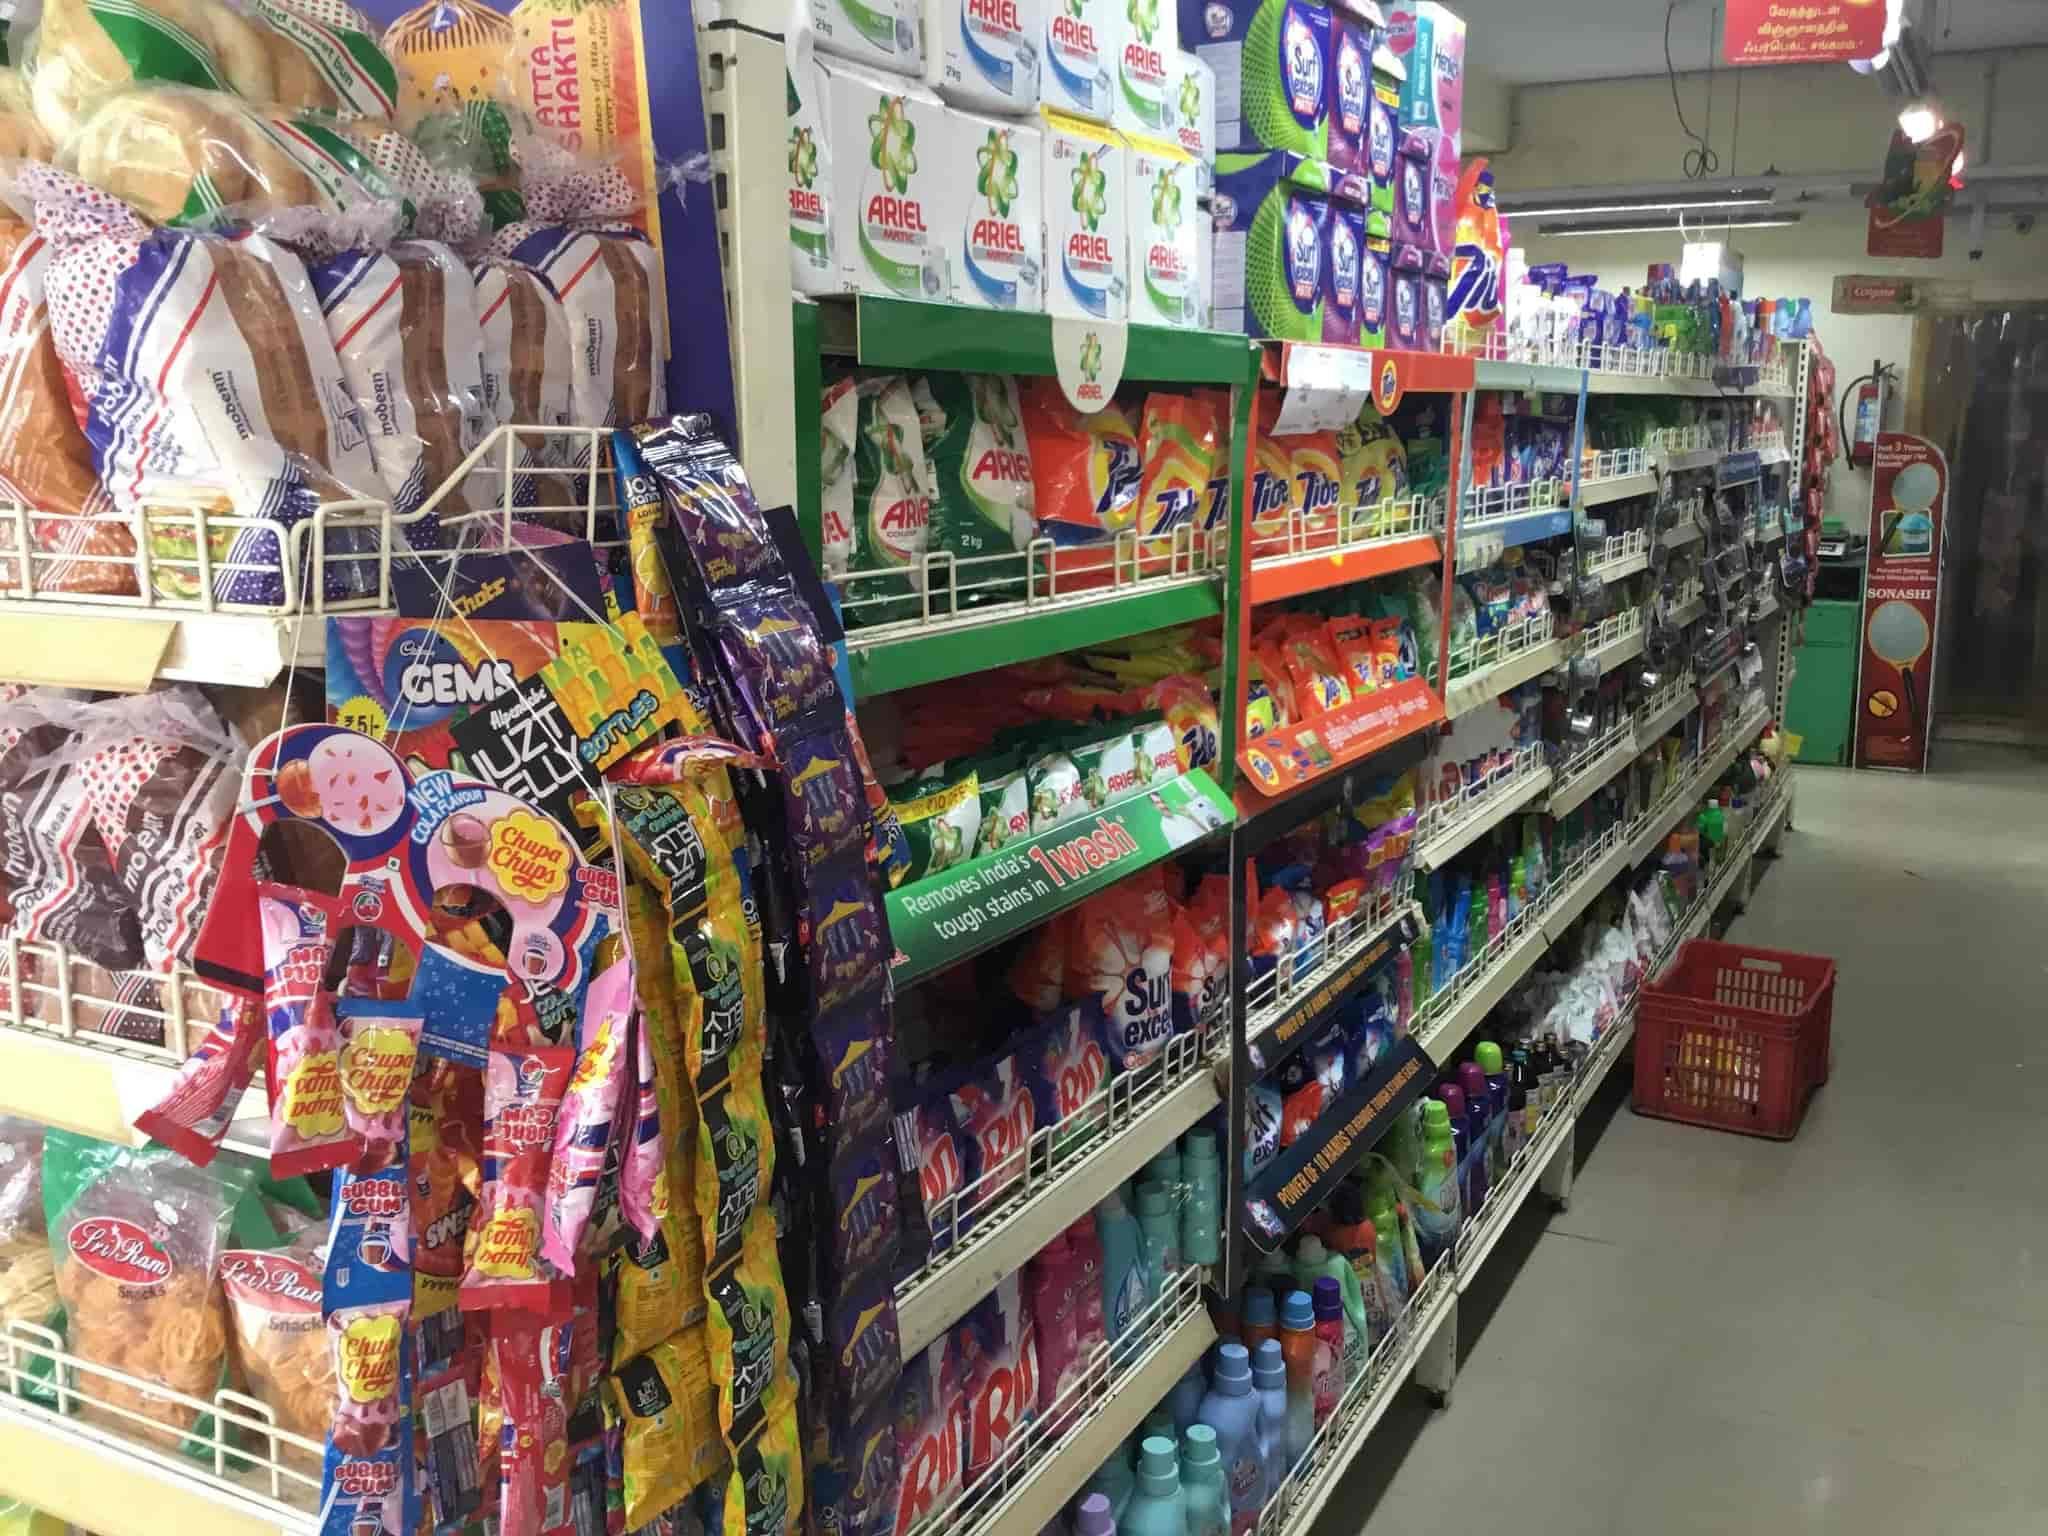 Chennai Fresh Supermarket, Thiruverkadu, Chennai - Water